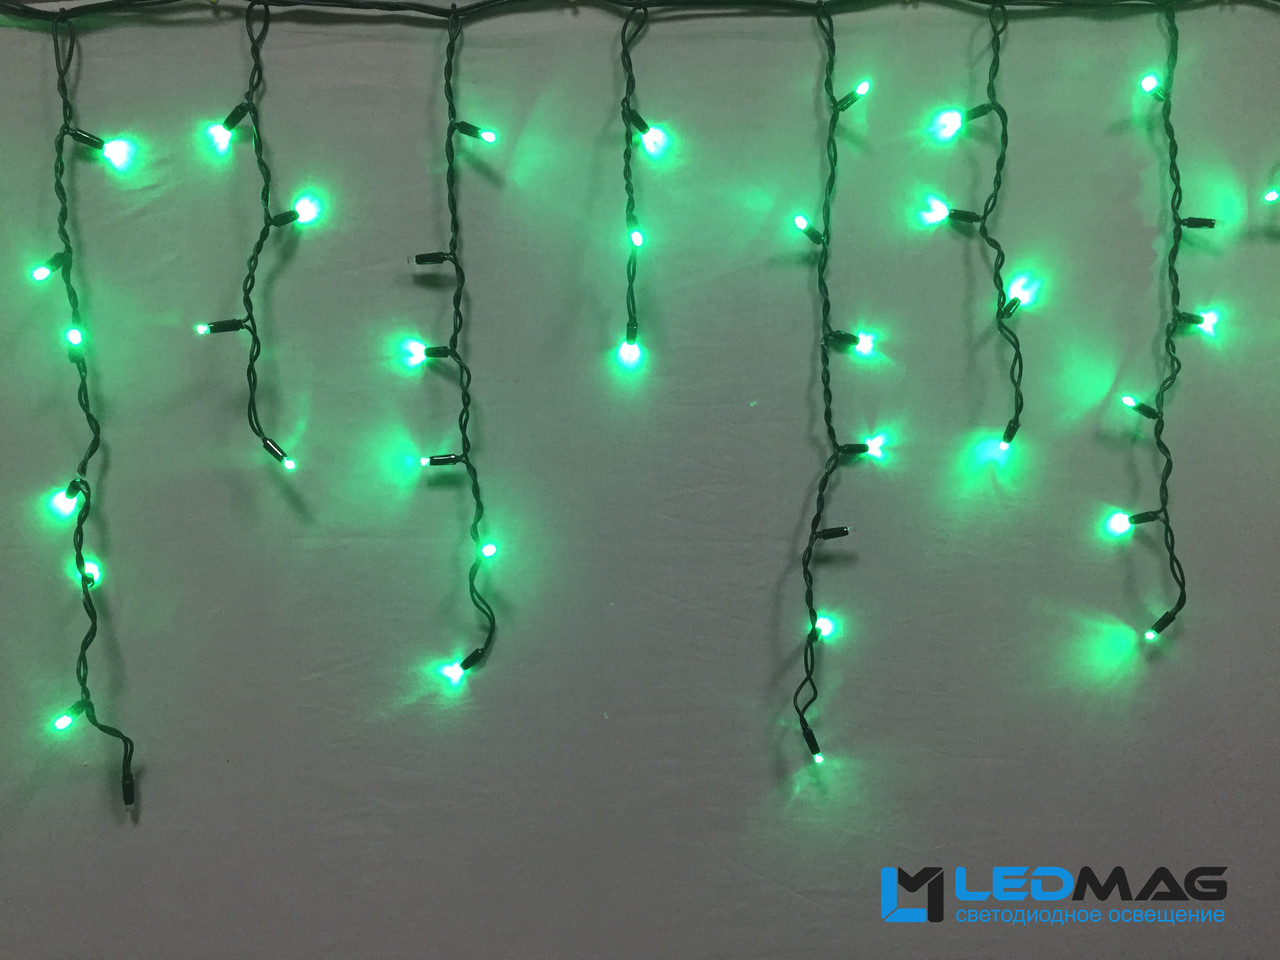 Светодиодная гирлянда уличная Бахрома Flash 3х0.7 м 100LED Каучук Зеленый